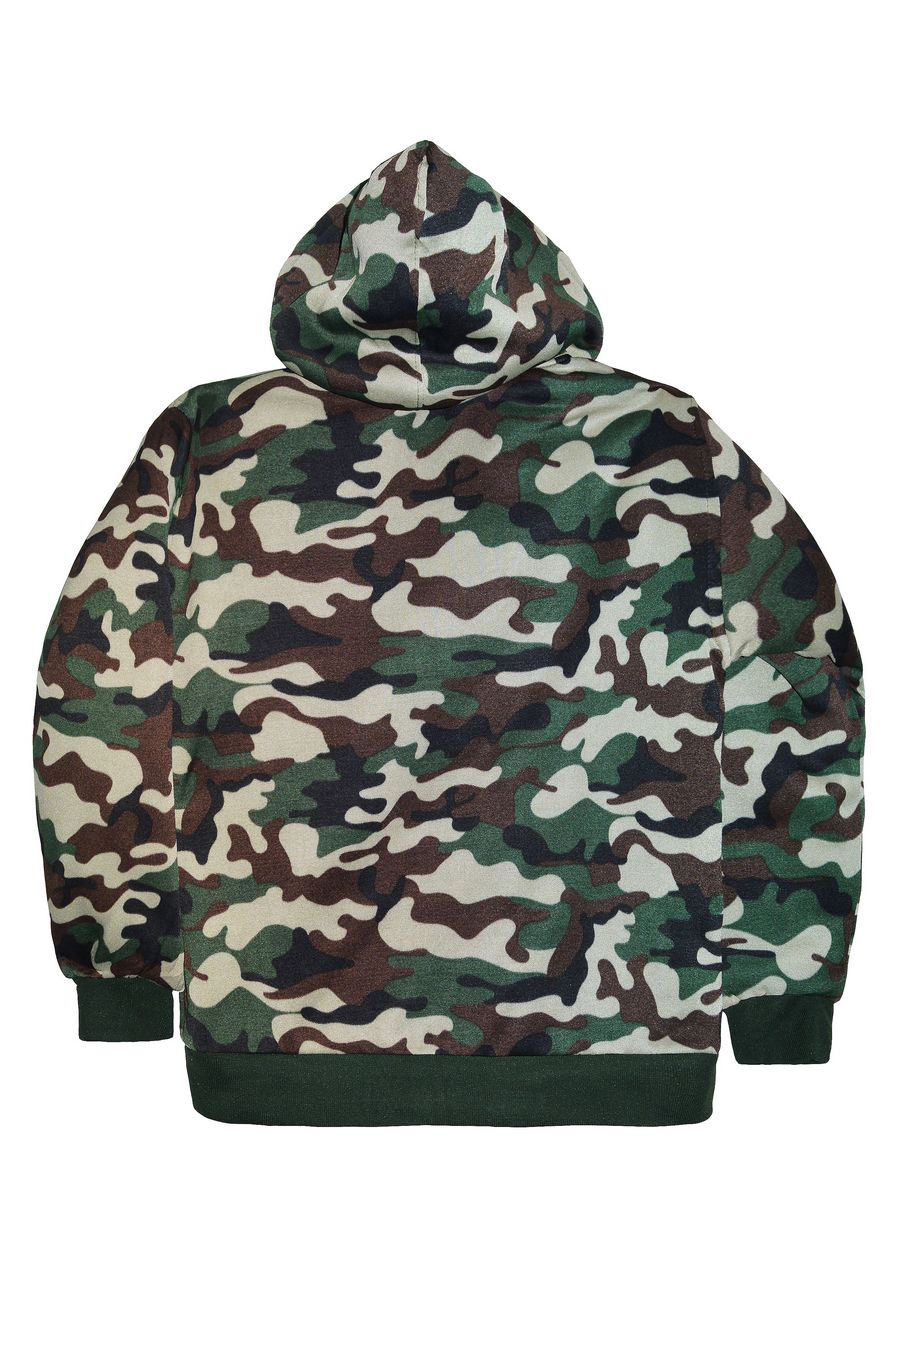 Куртка мужская Rosser 01 светлая камуфляж утепленная - фото 2